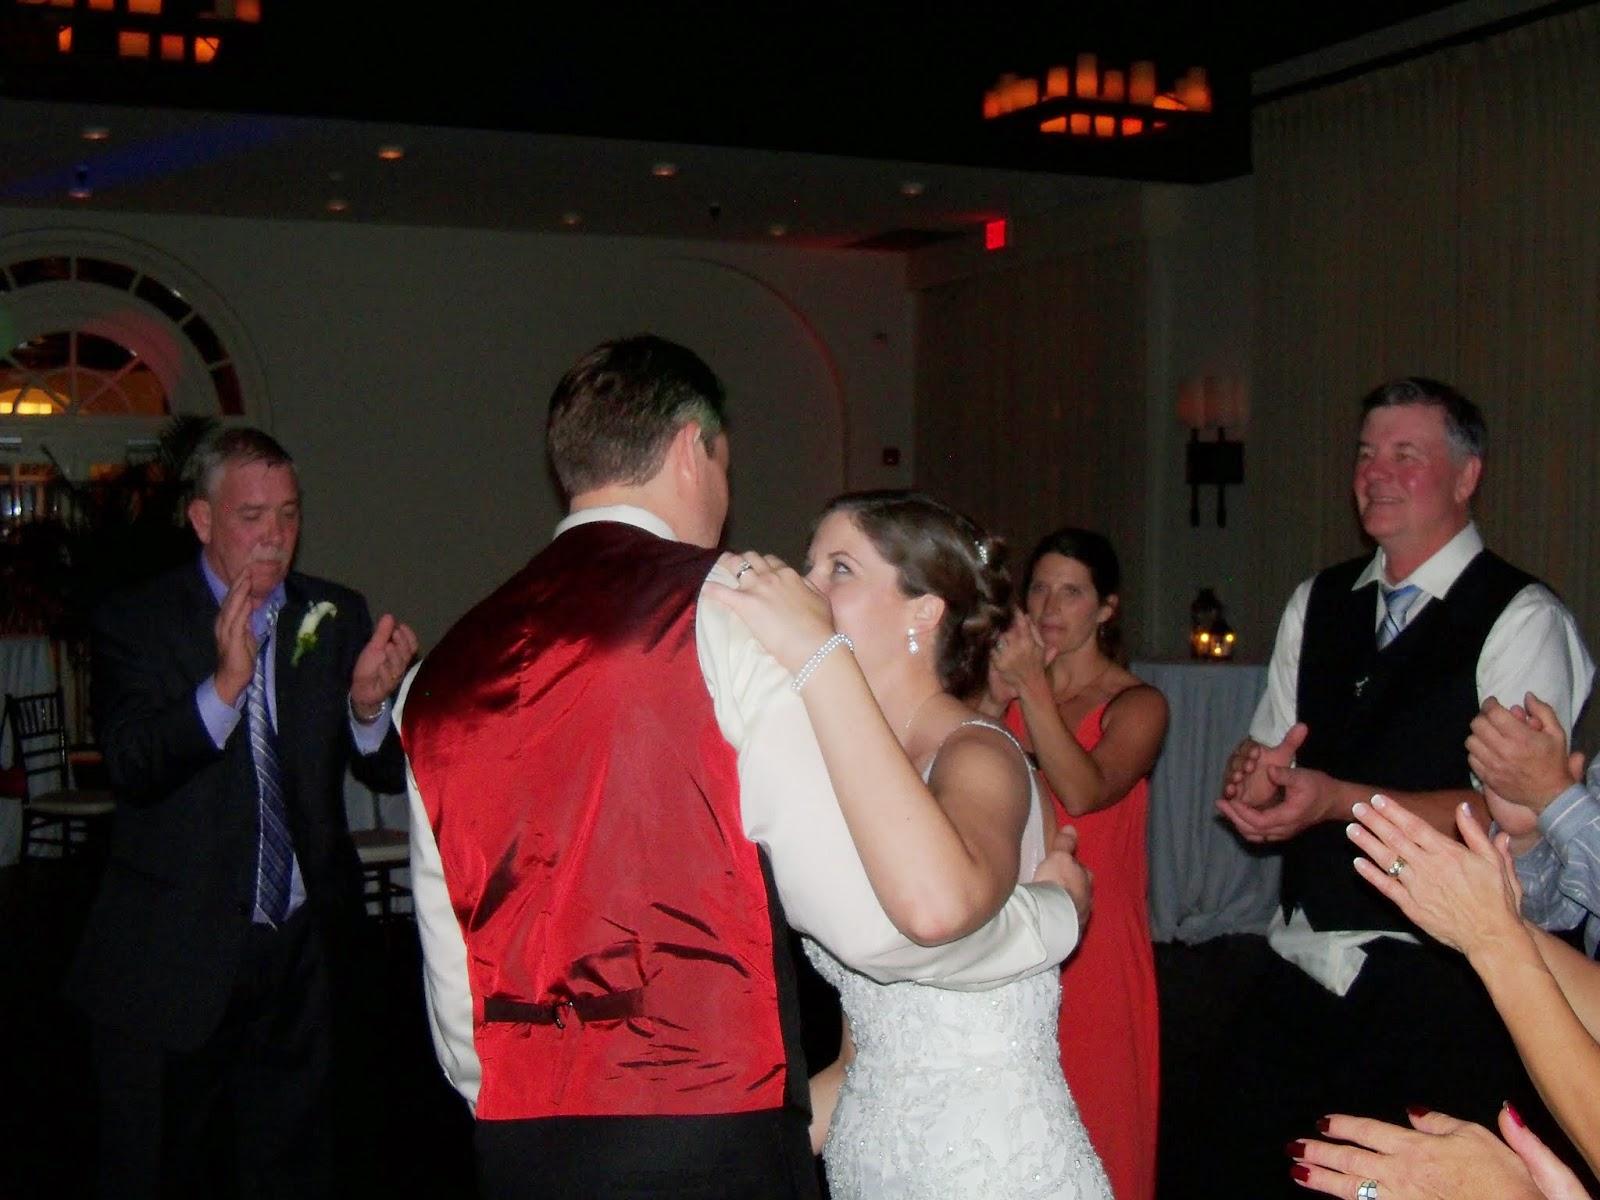 Franks Wedding - 116_6022.JPG